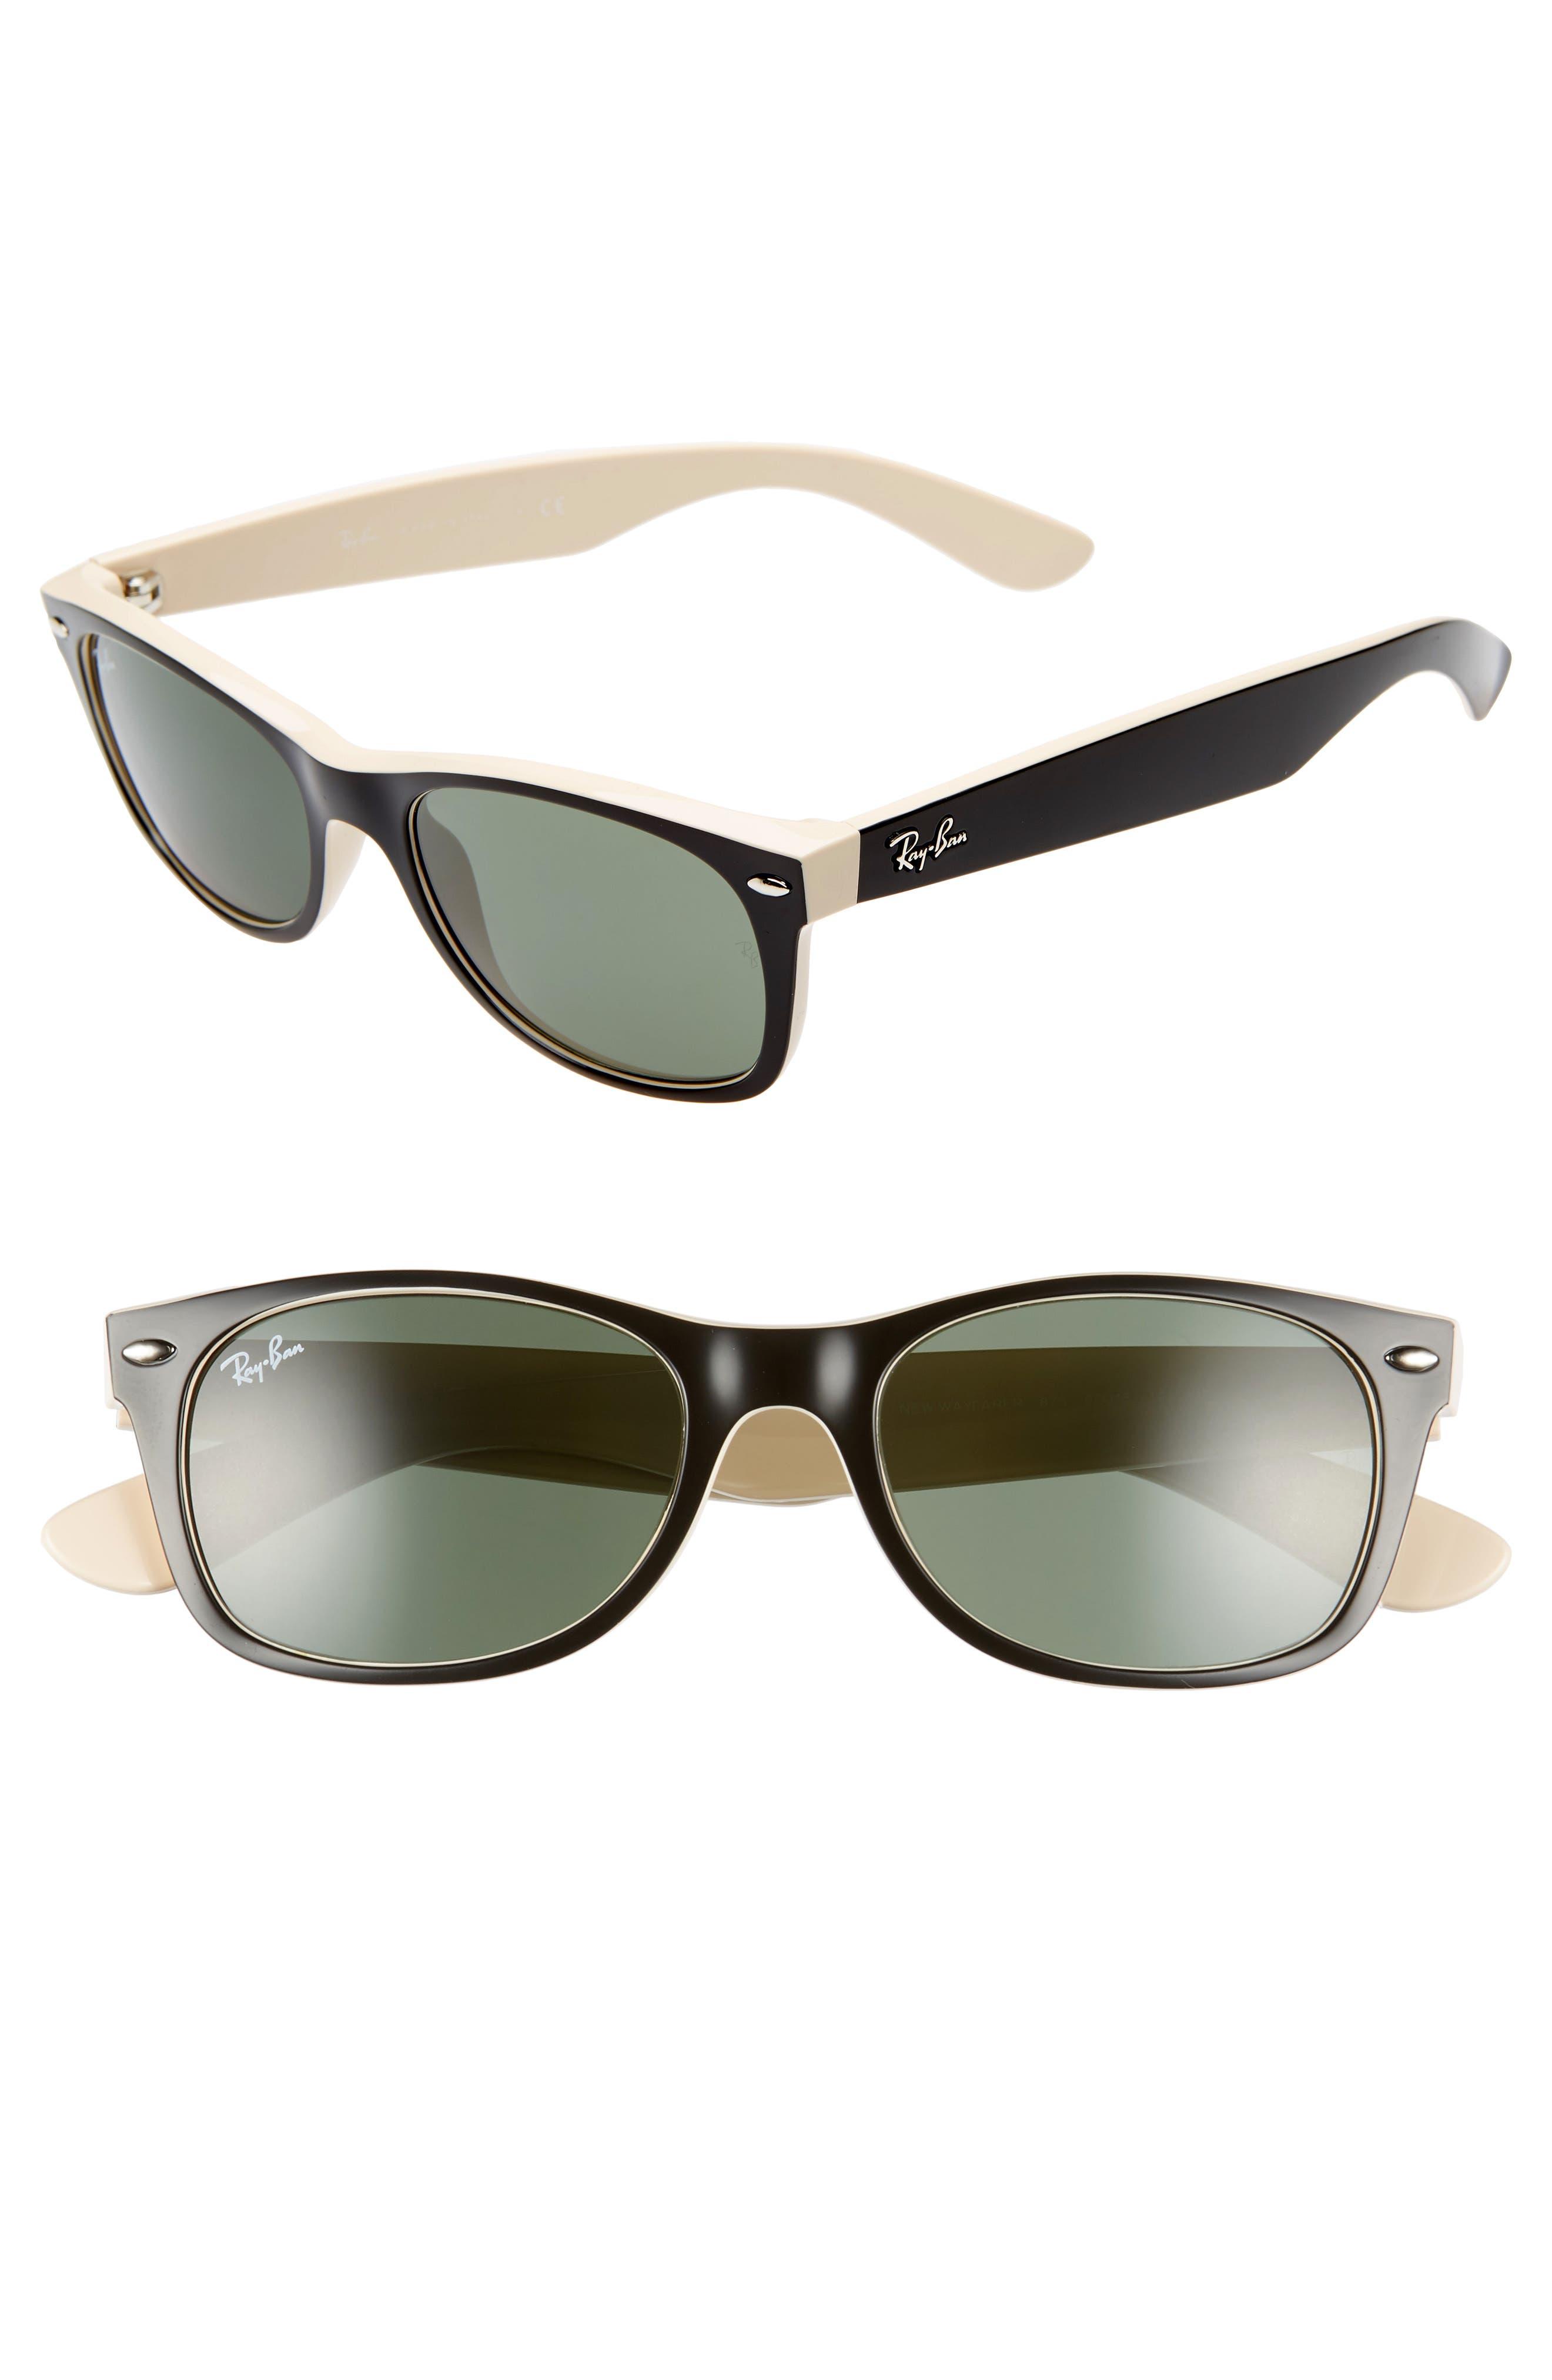 Ray-Ban Small New Wayfarer 52Mm Sunglasses -